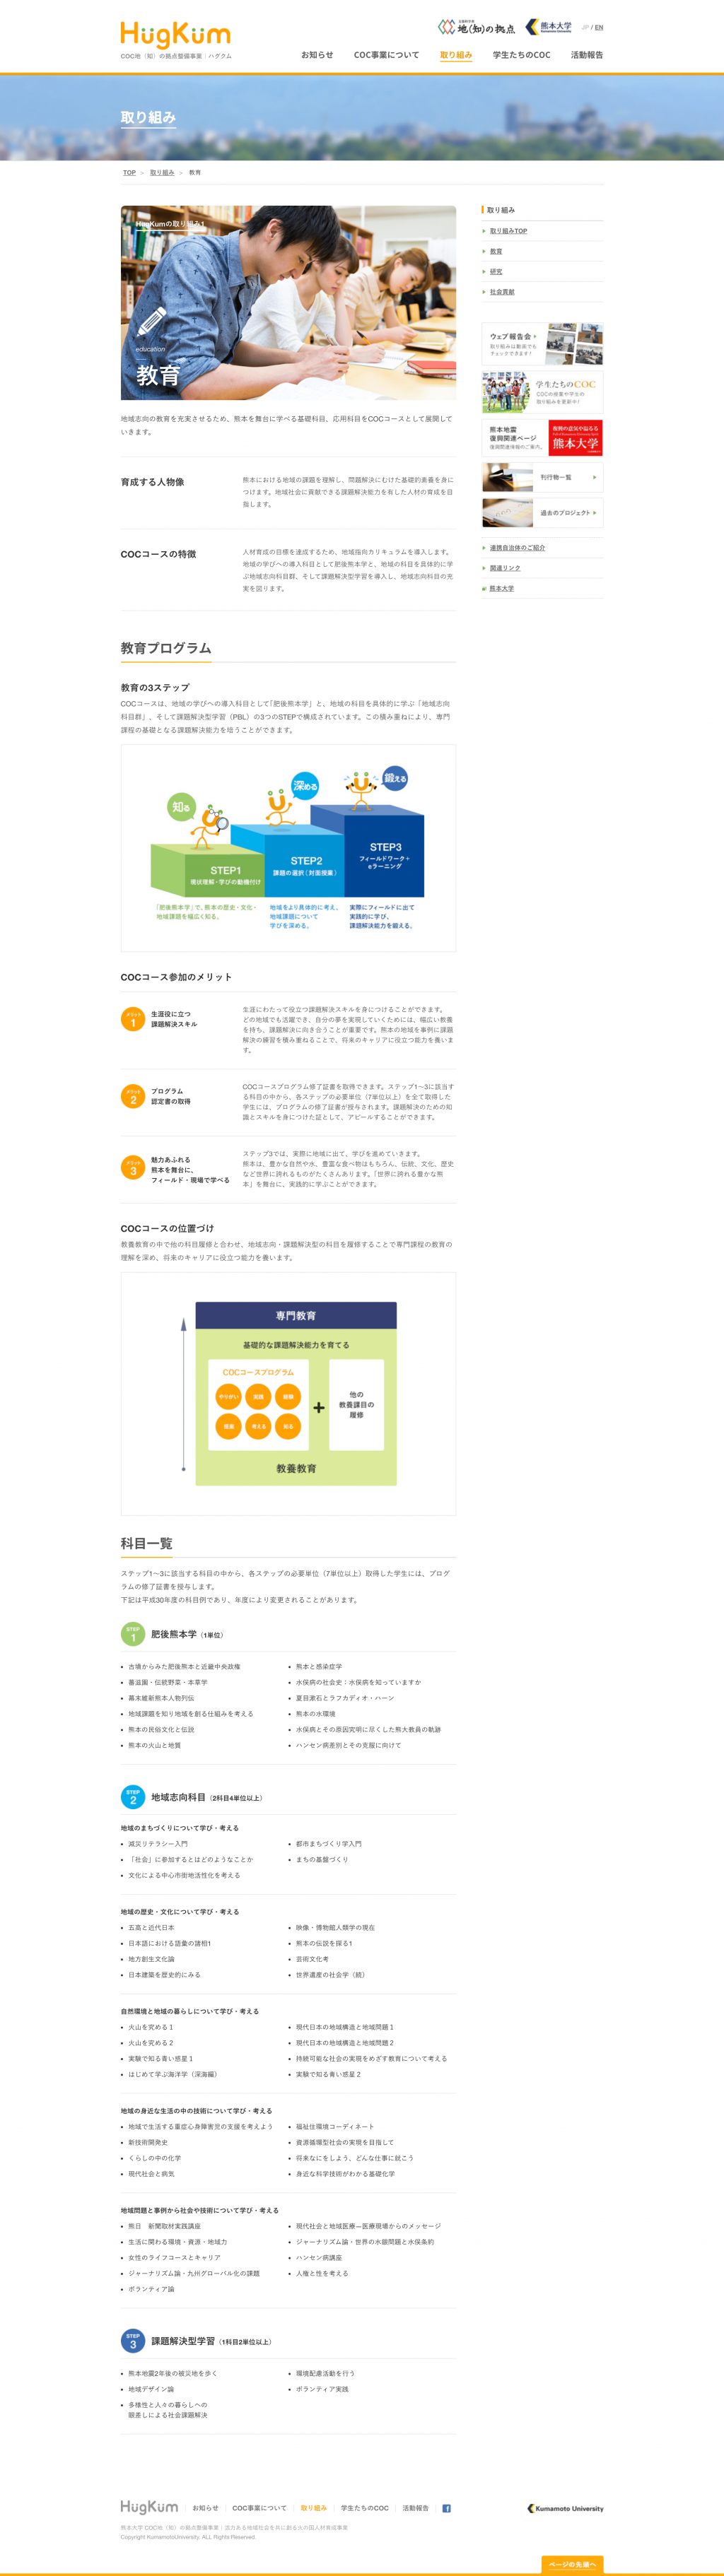 HugKum 熊本大学COC事業サイトのパソコン表示